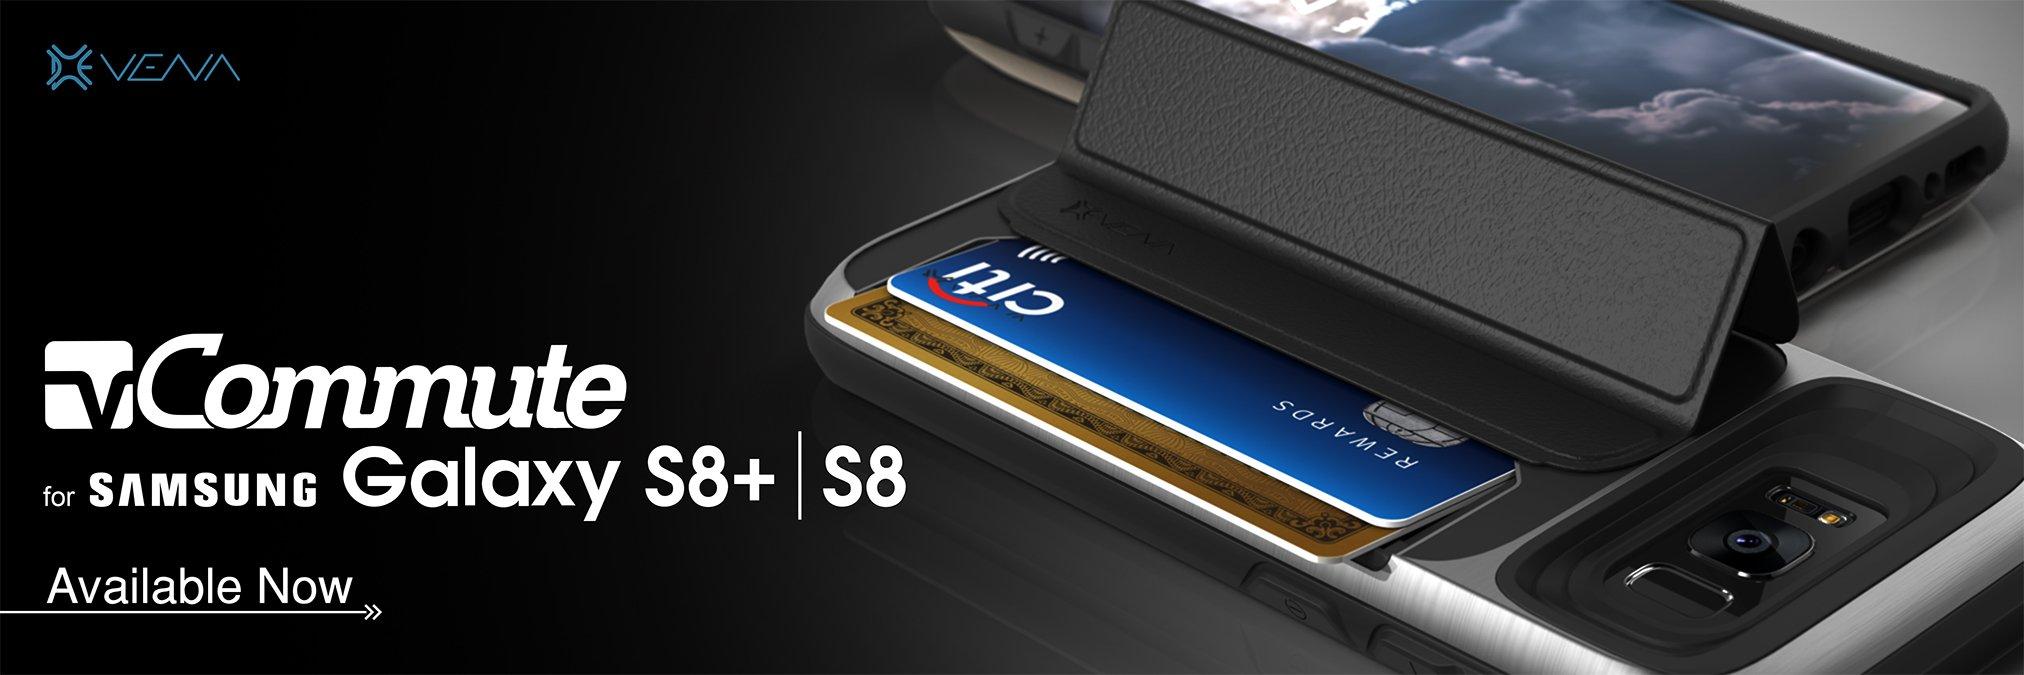 vCommute Galaxy S8